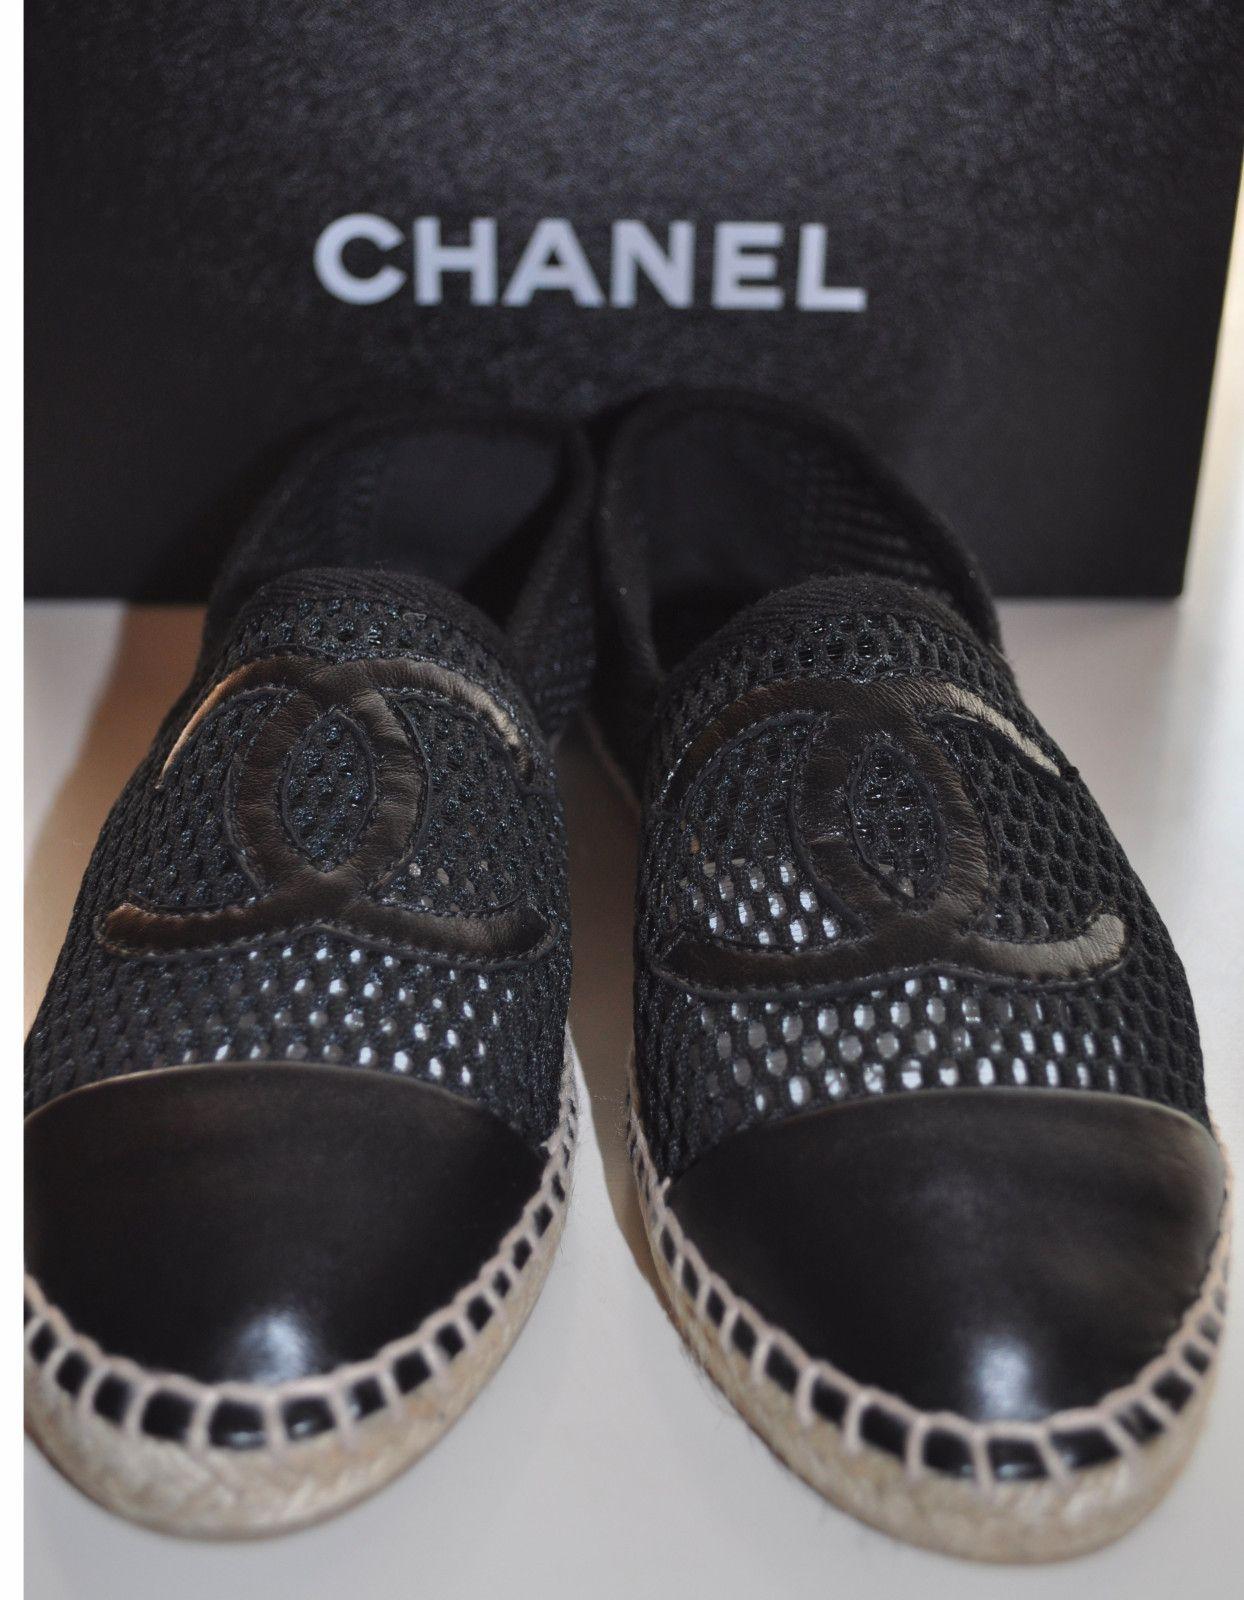 Chanel Espadrilles Black Mesh Leather